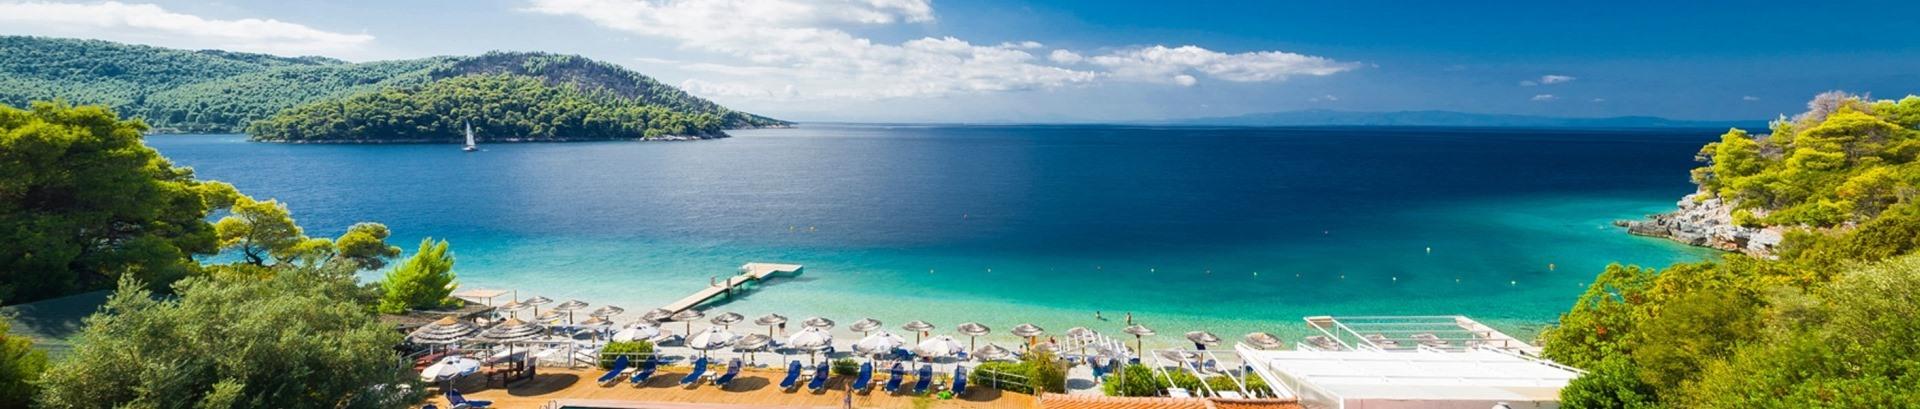 Grčka ostrva avionom leto 2017